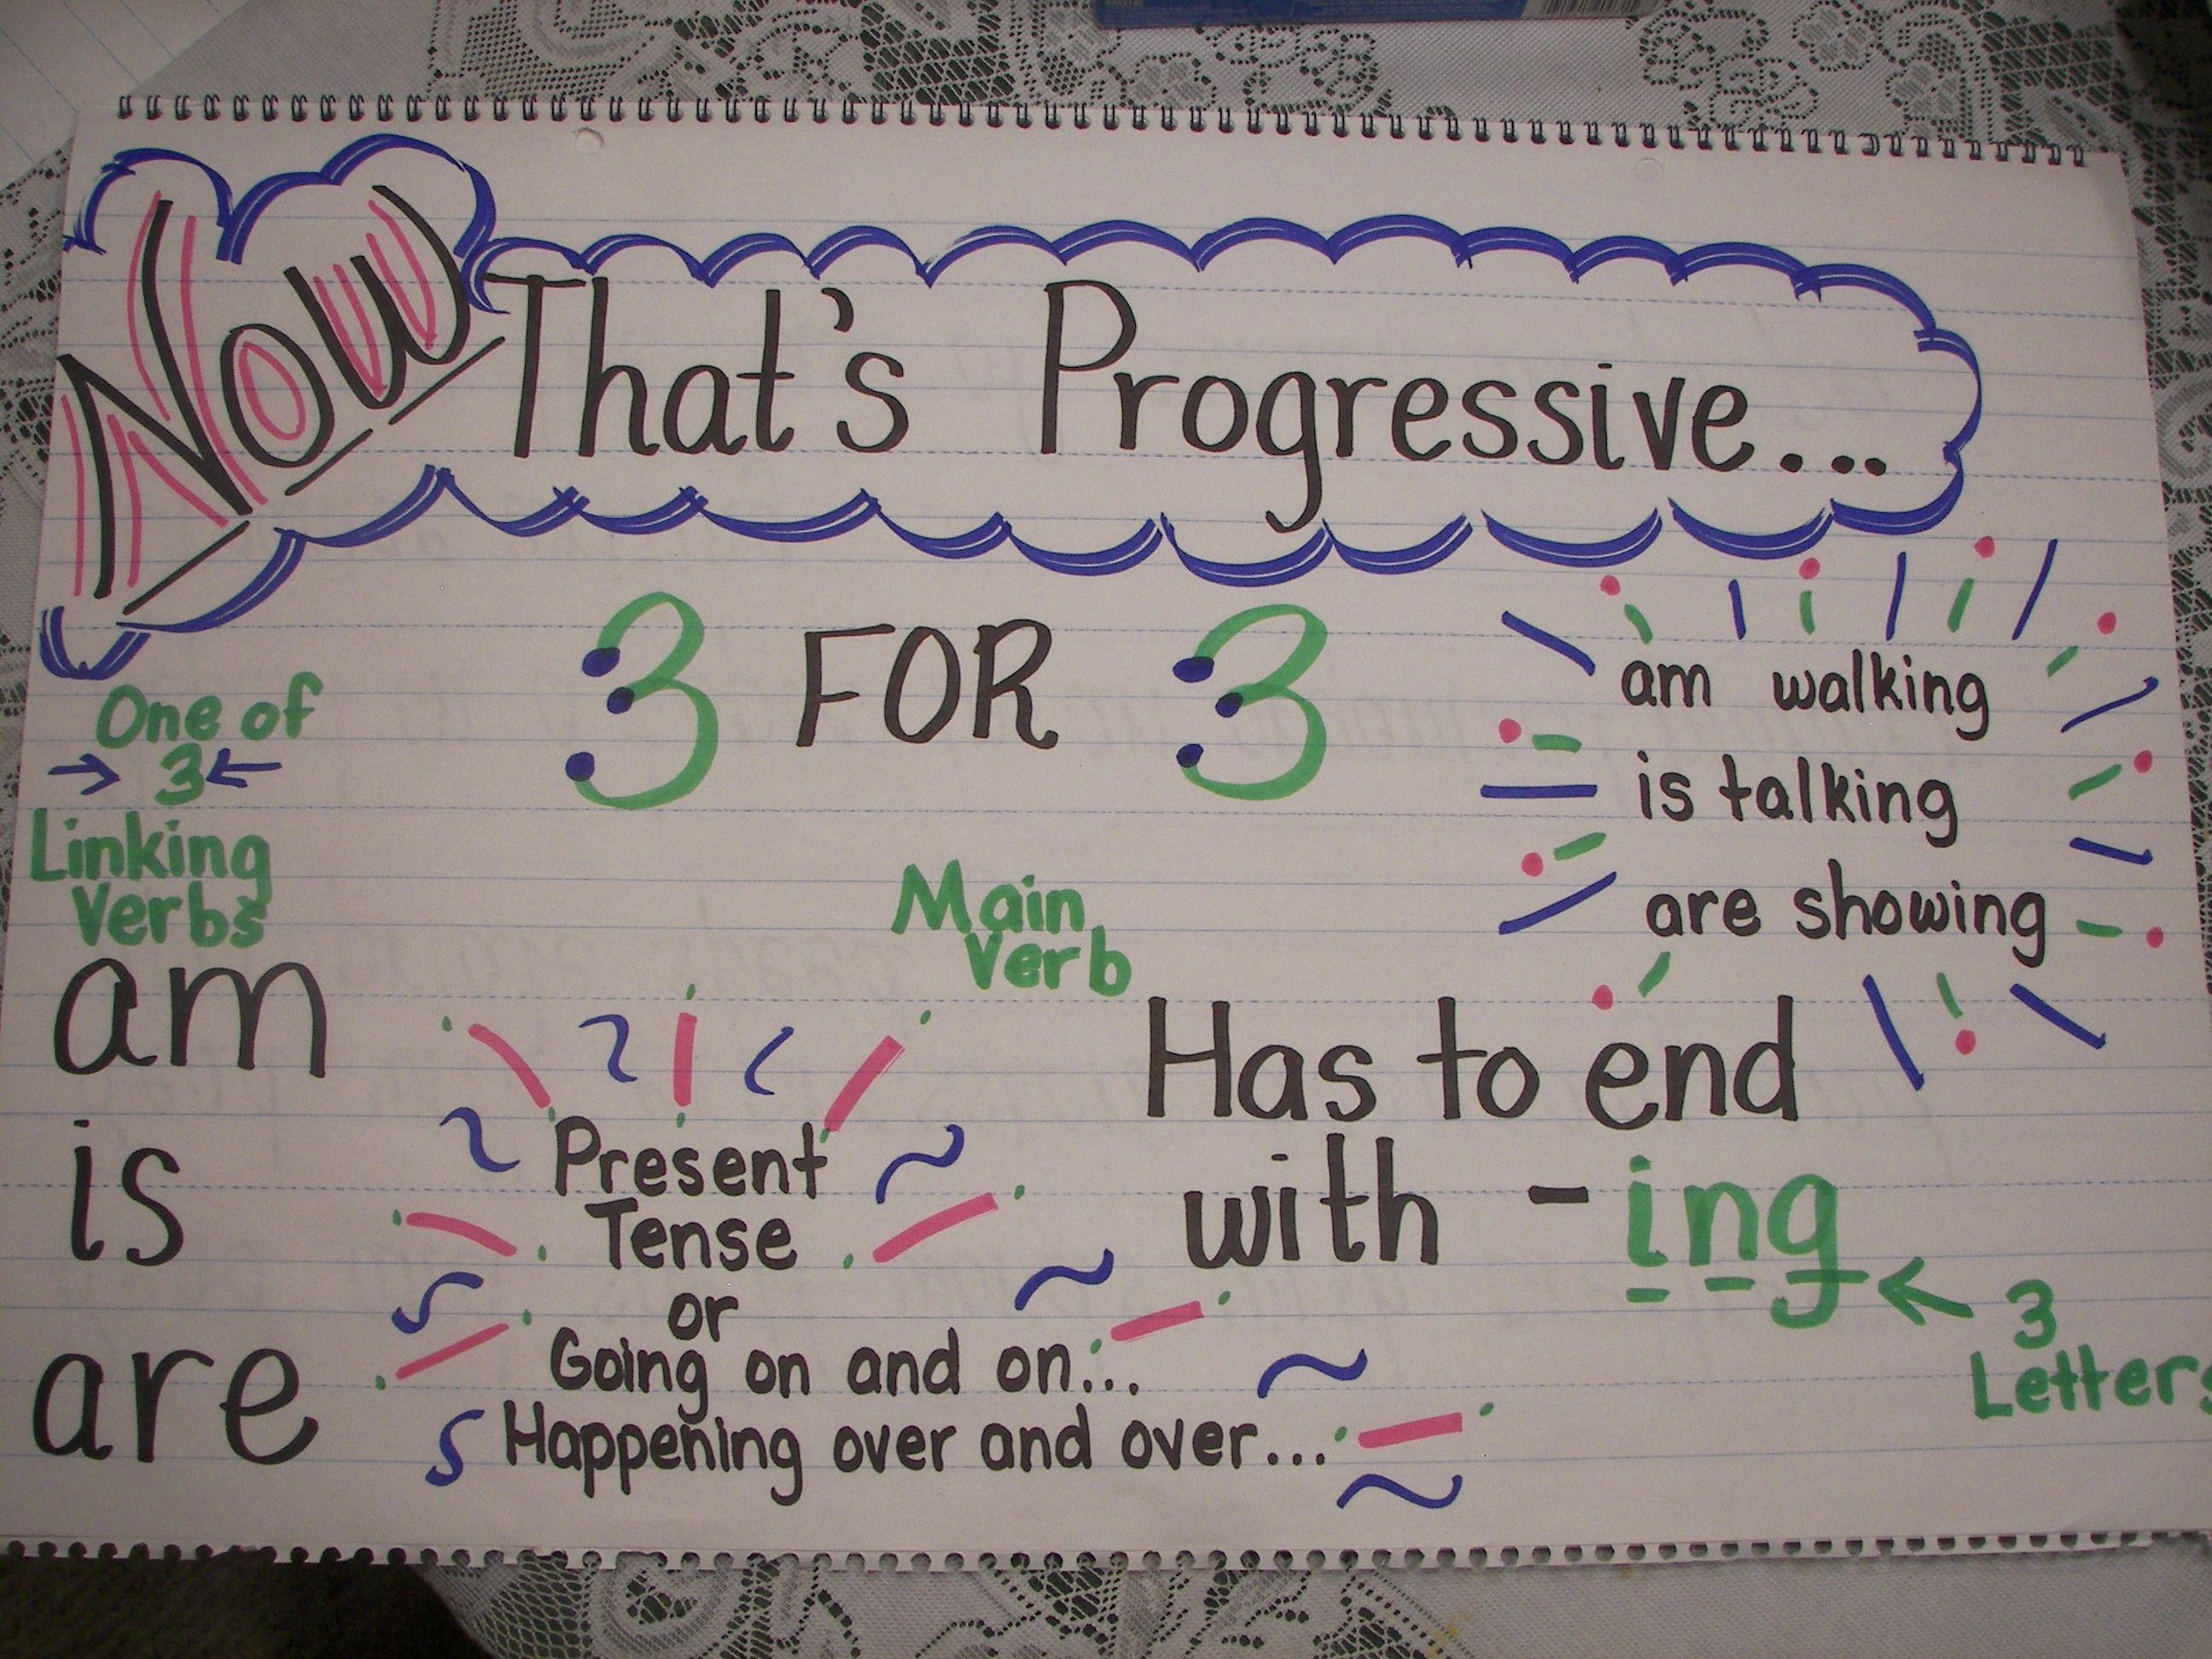 Pin By Cindy Pullen On School Verbs Anchor Chart Progressive Verbs Linking Verbs [ 1944 x 2592 Pixel ]